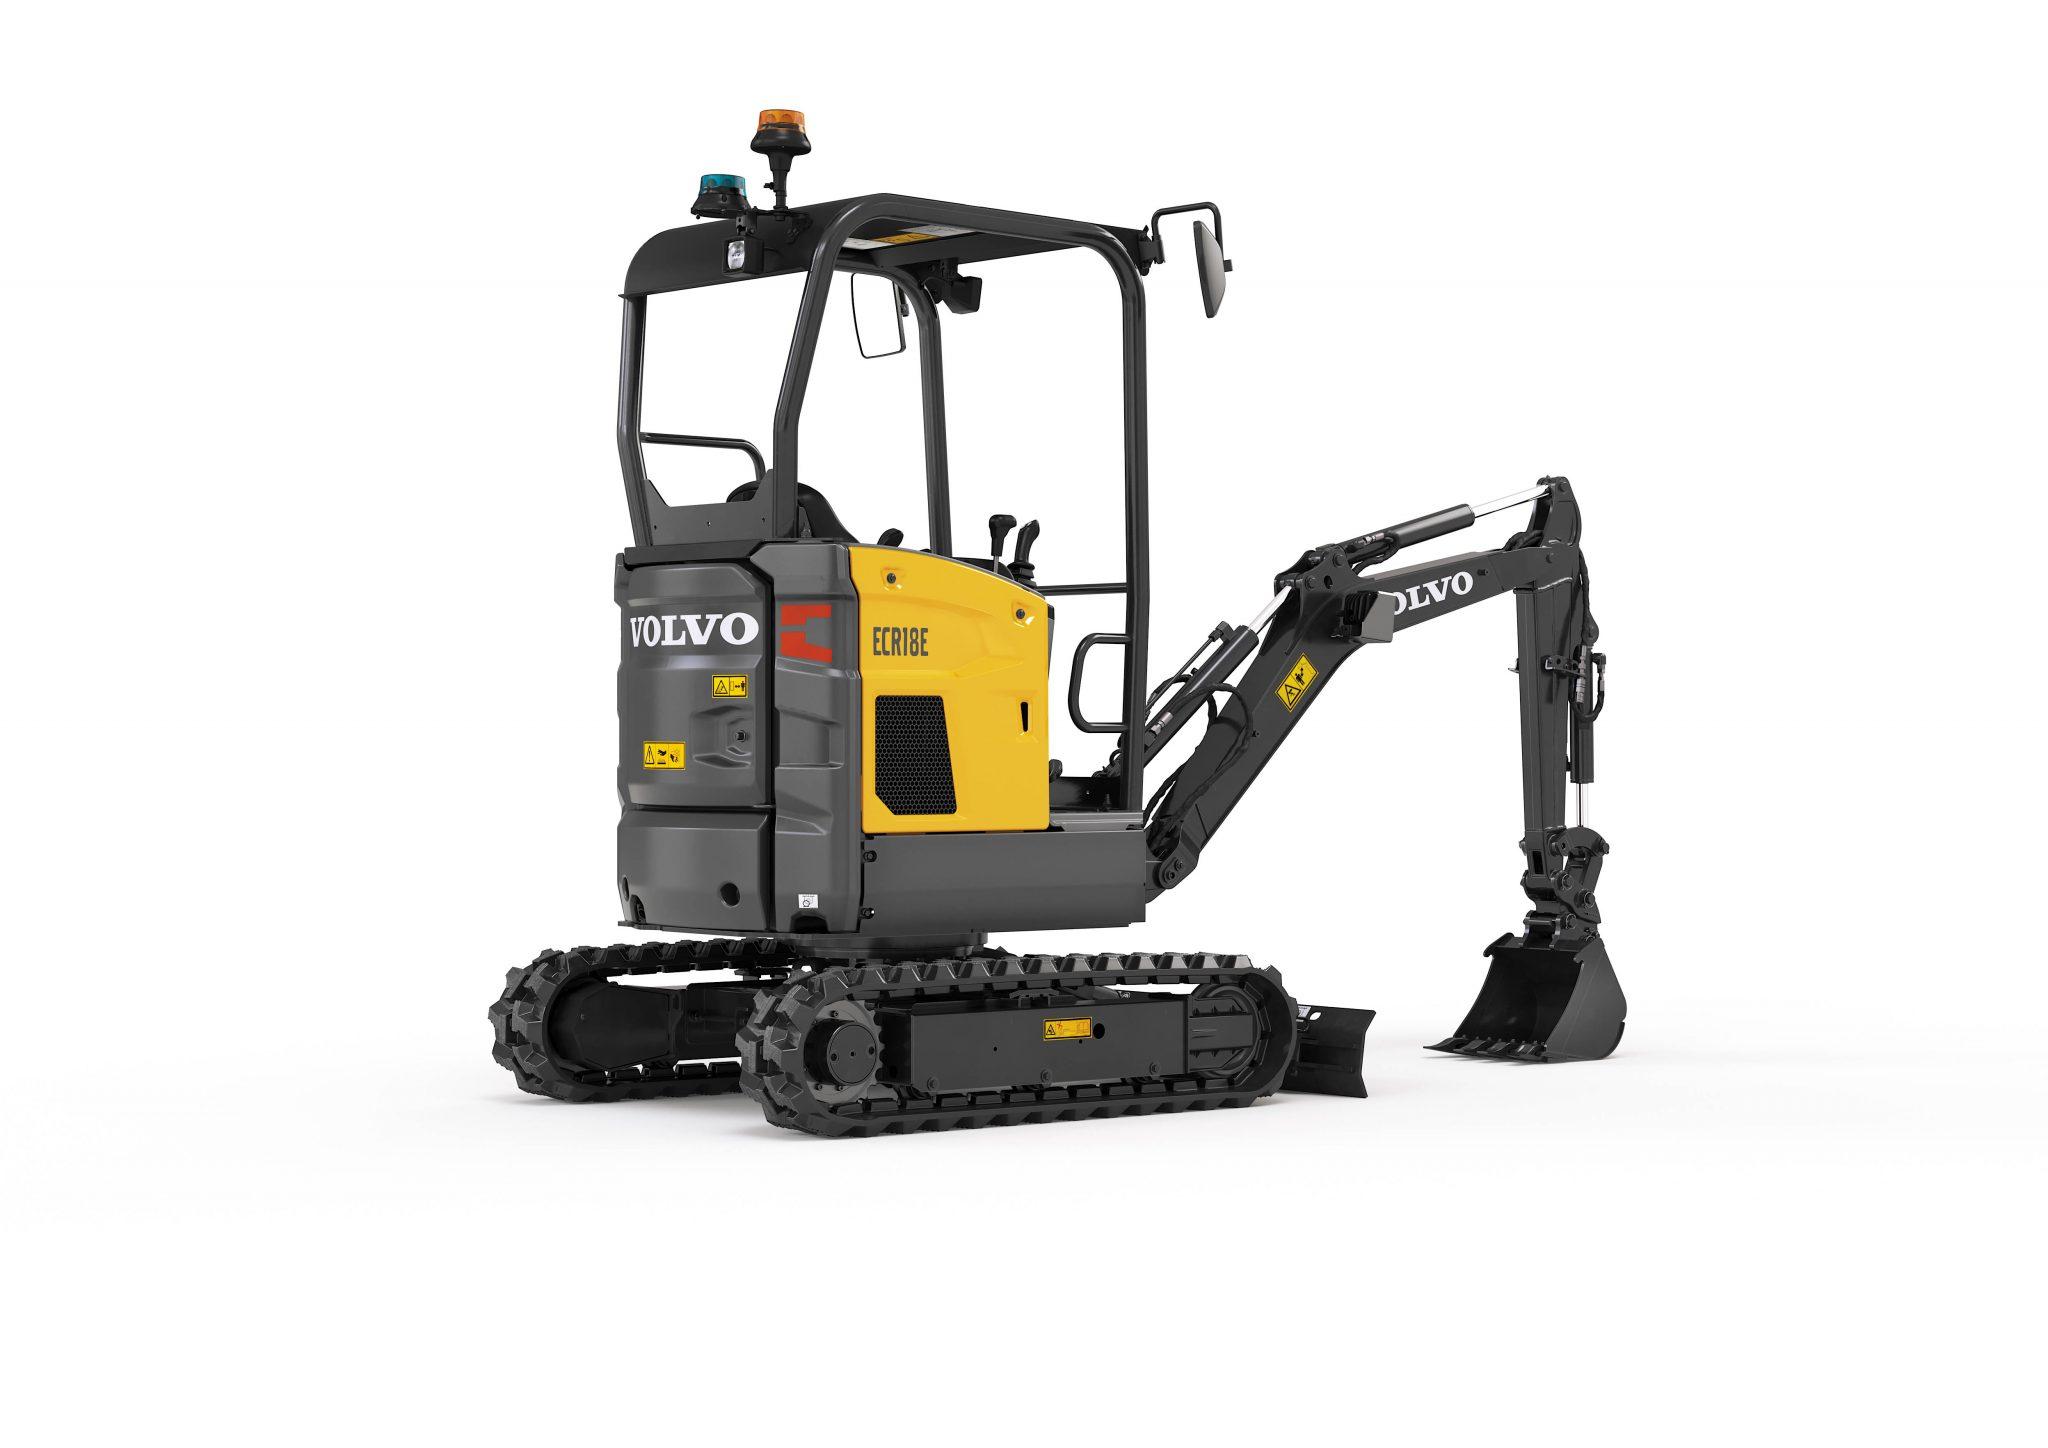 Volvo_Compact_Excavator_ECR18E